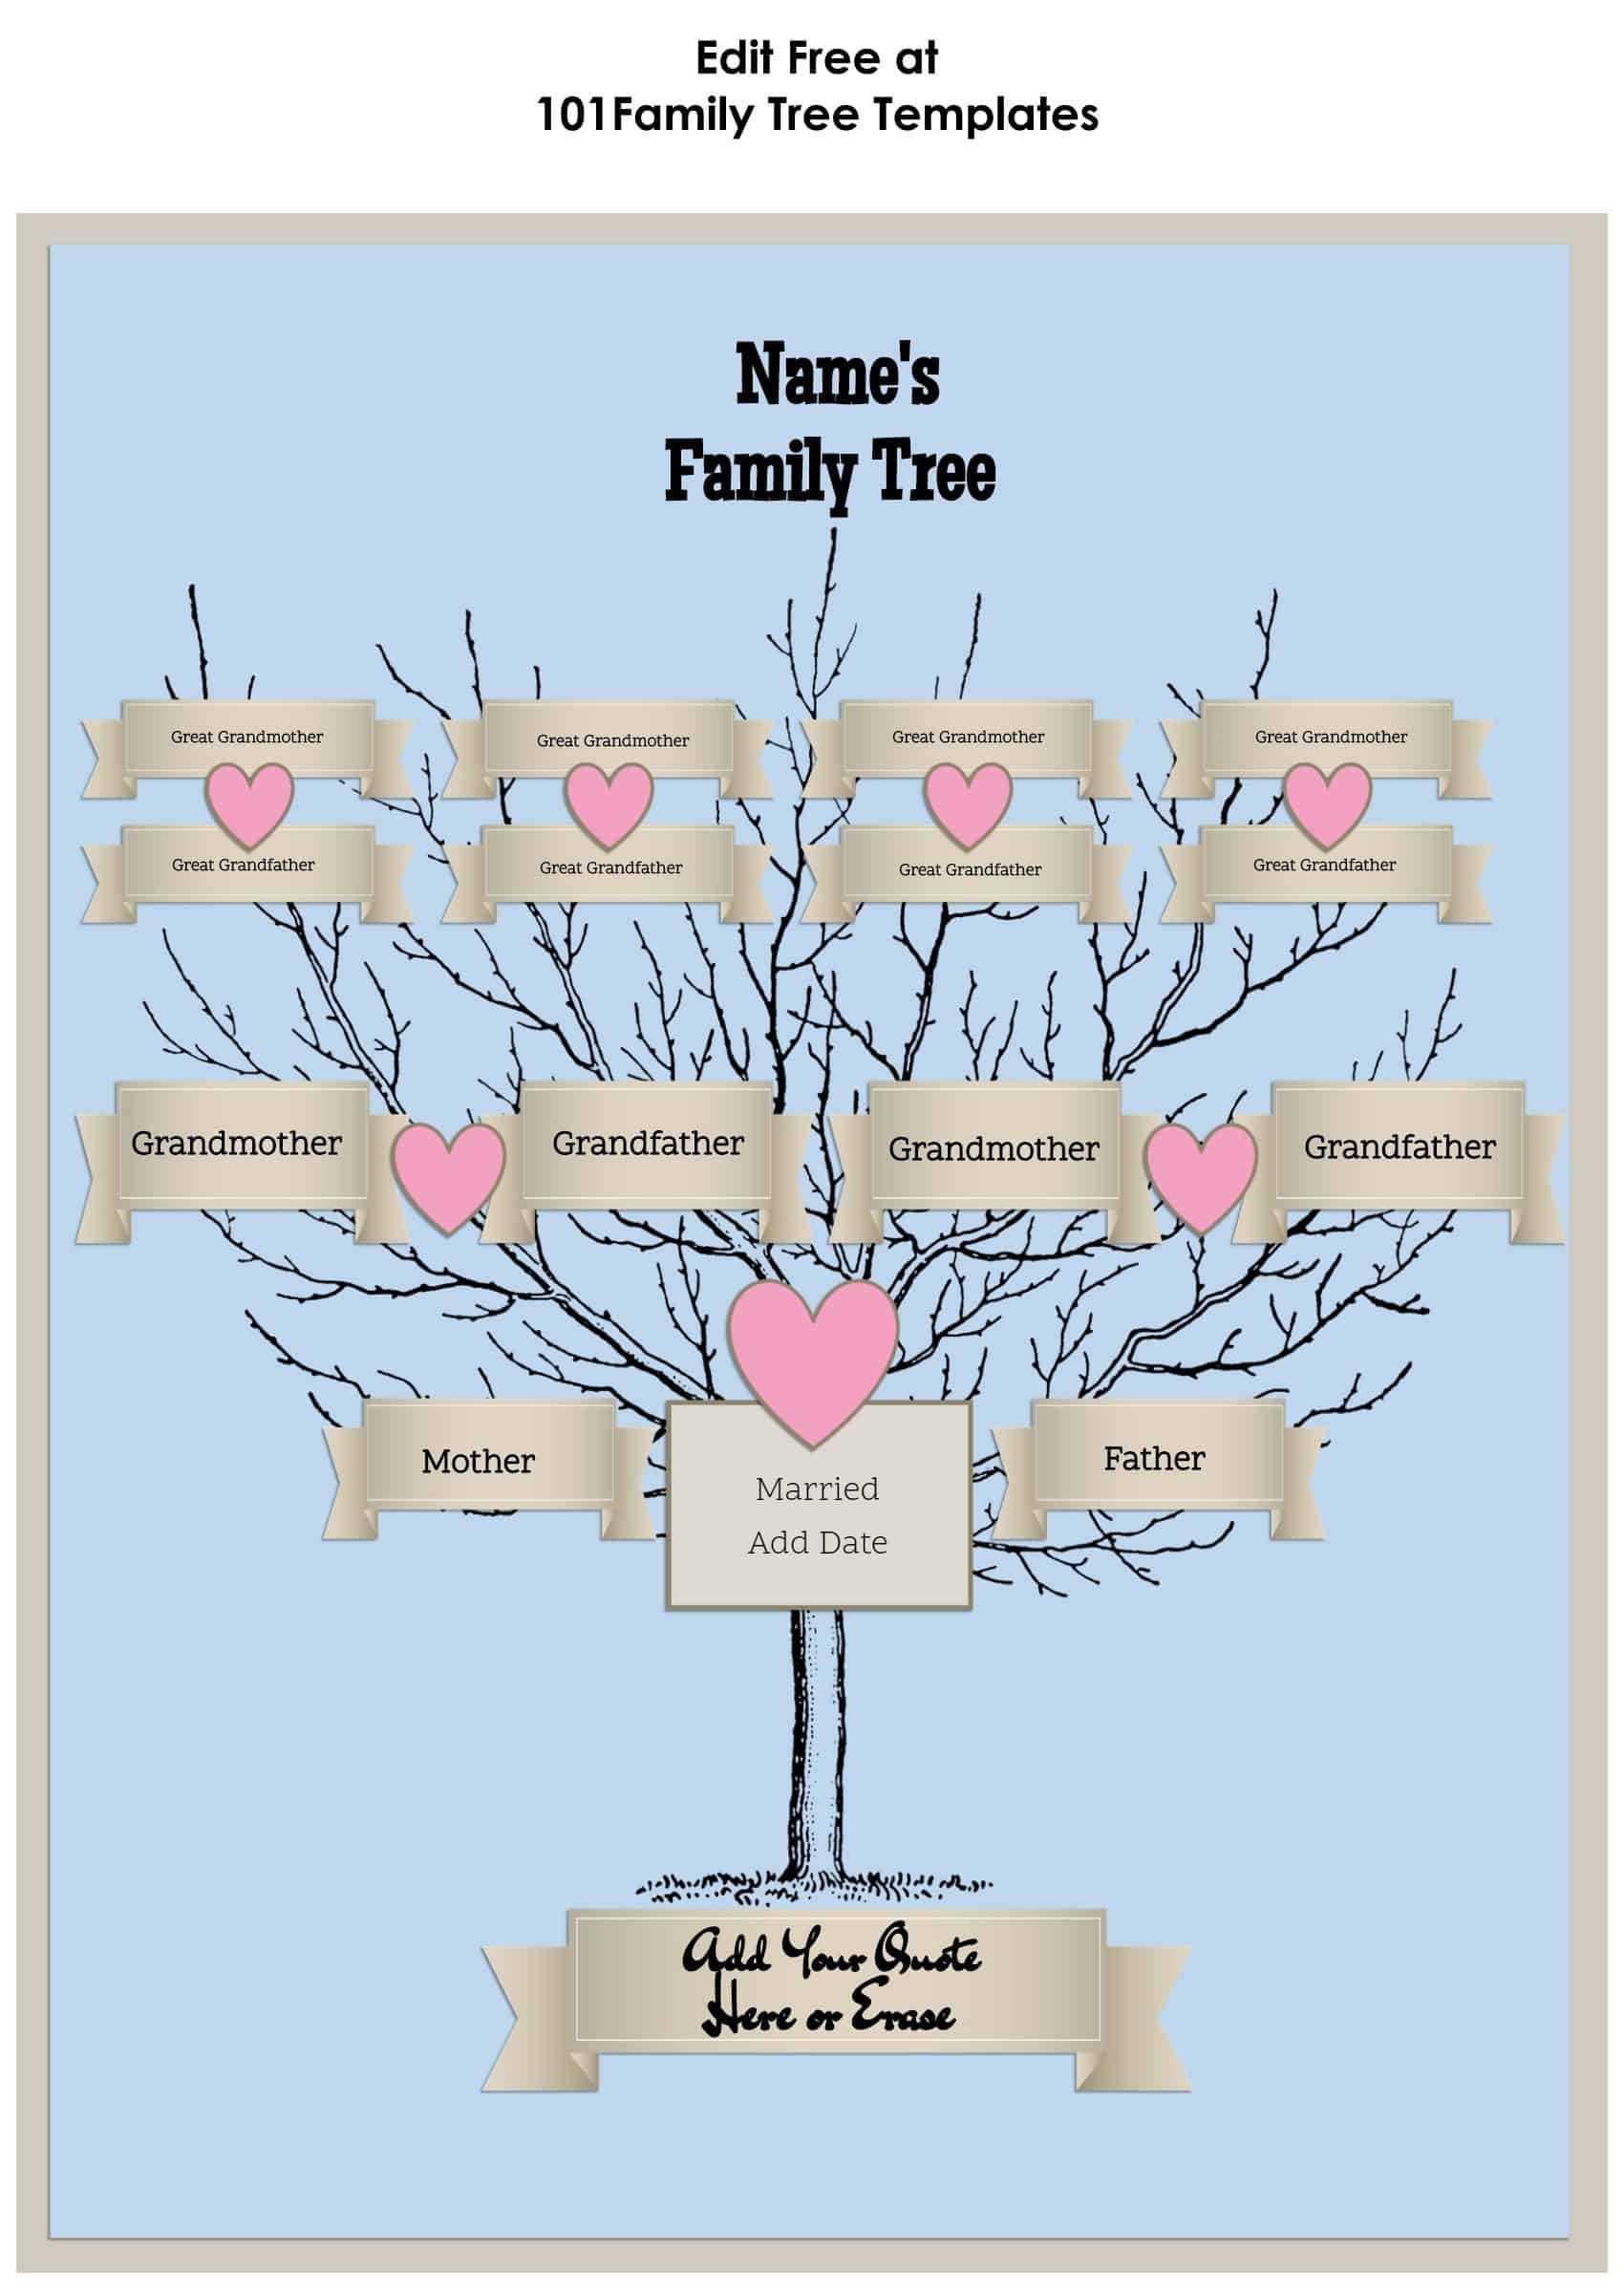 3 Generation Family Tree Generator | All Templates Are Free Throughout 3 Generation Family Tree Template Word